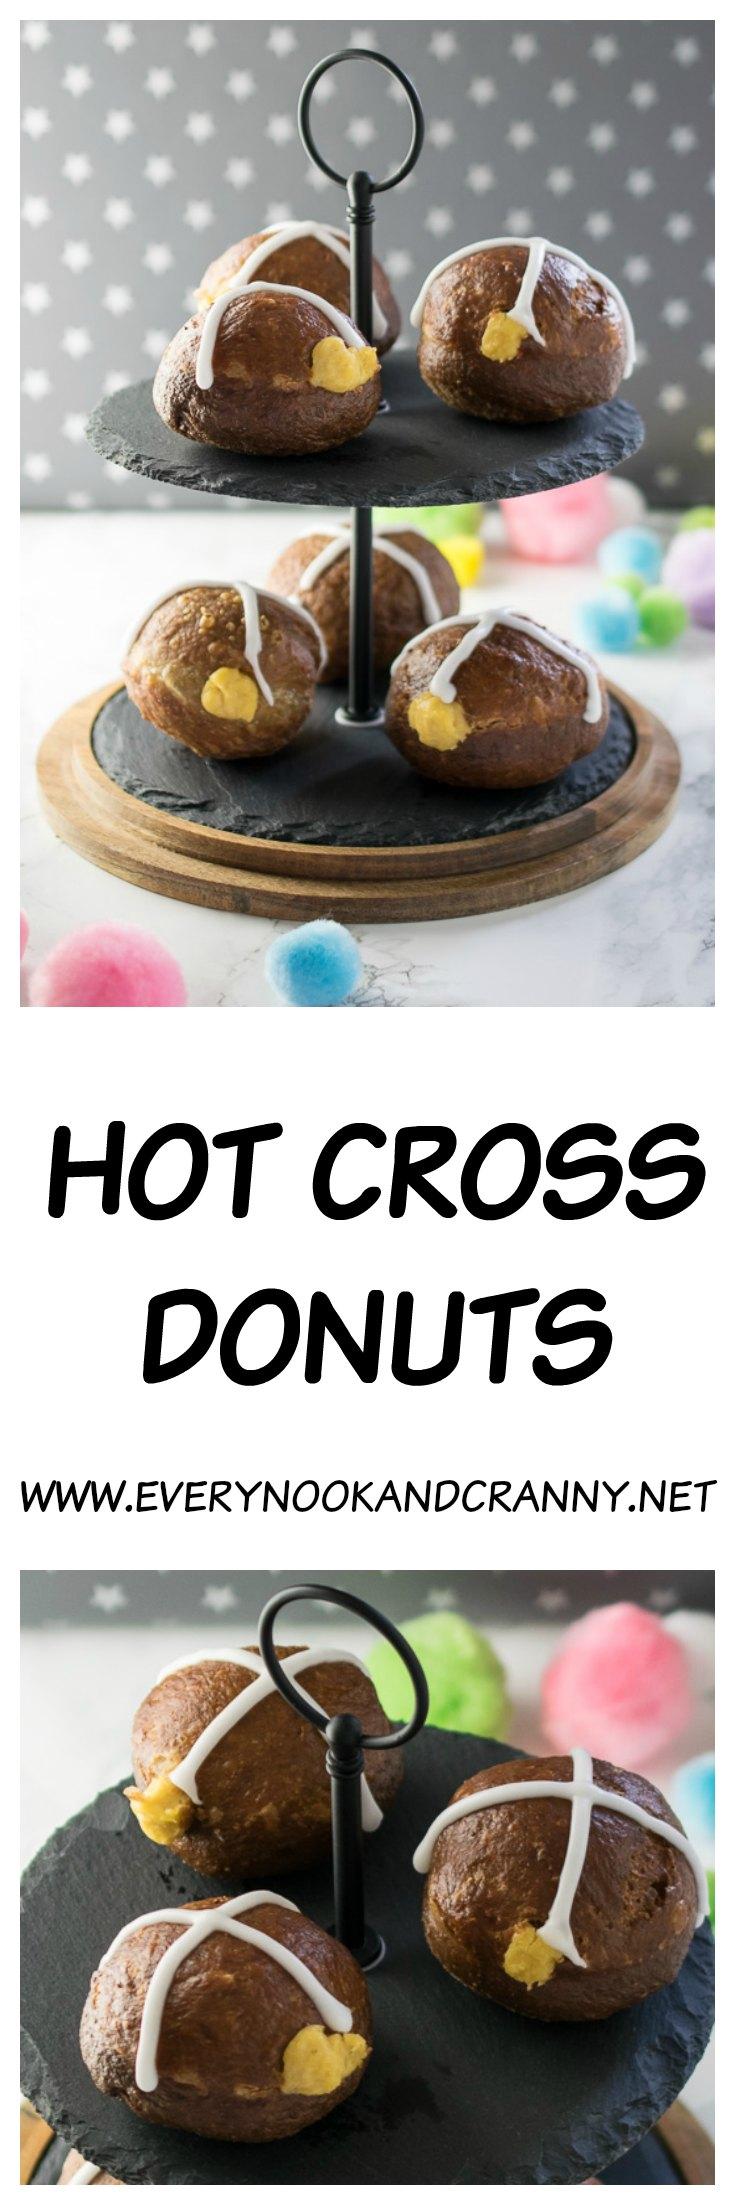 Hot cross donuts